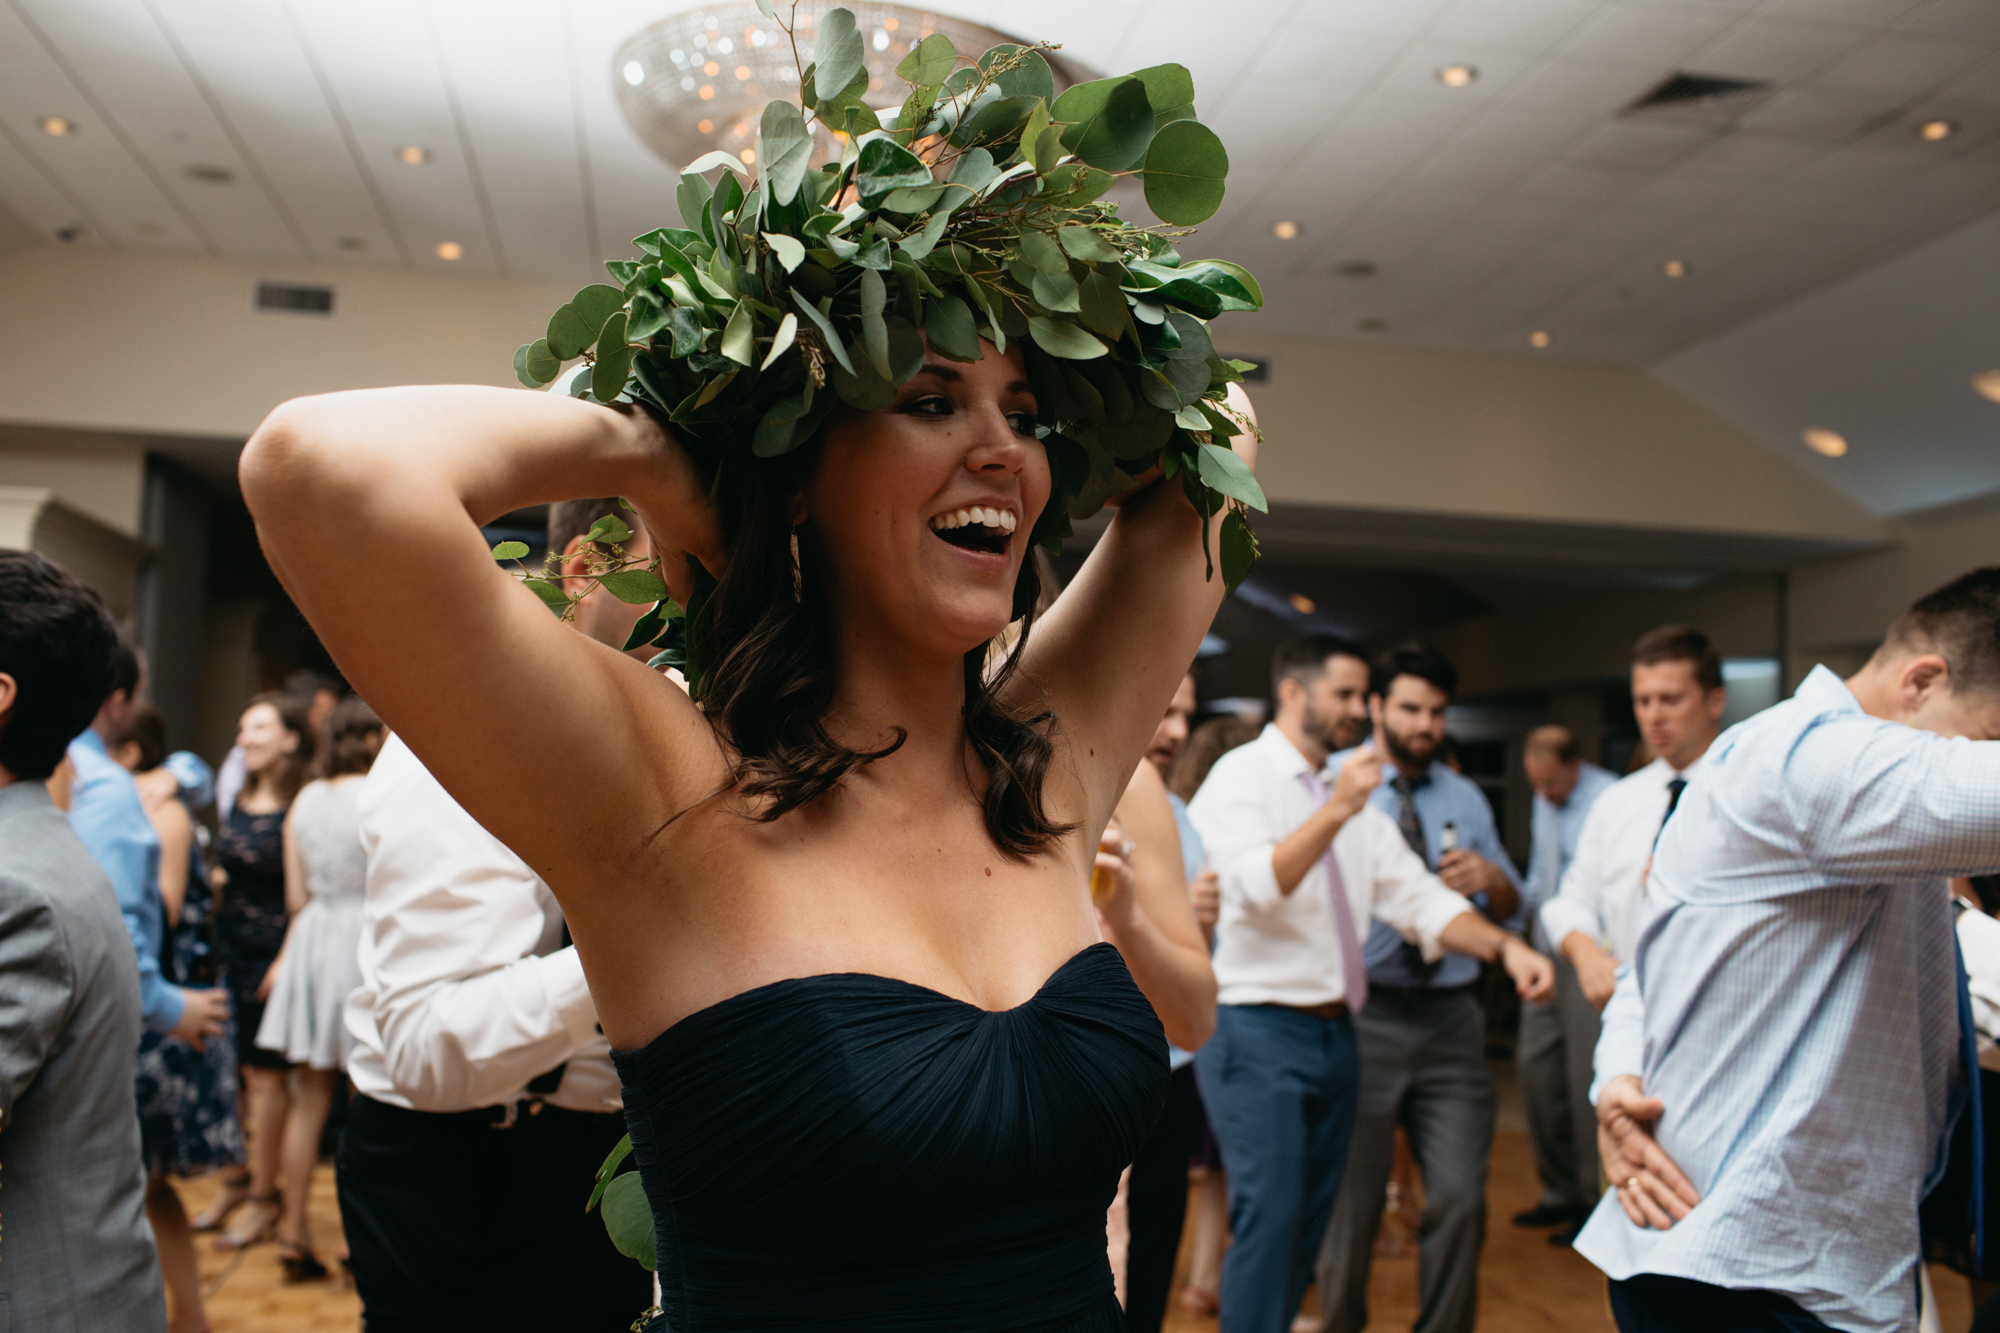 Jaclyn_Andrew_quincy_massachusetts_wedding033.jpg